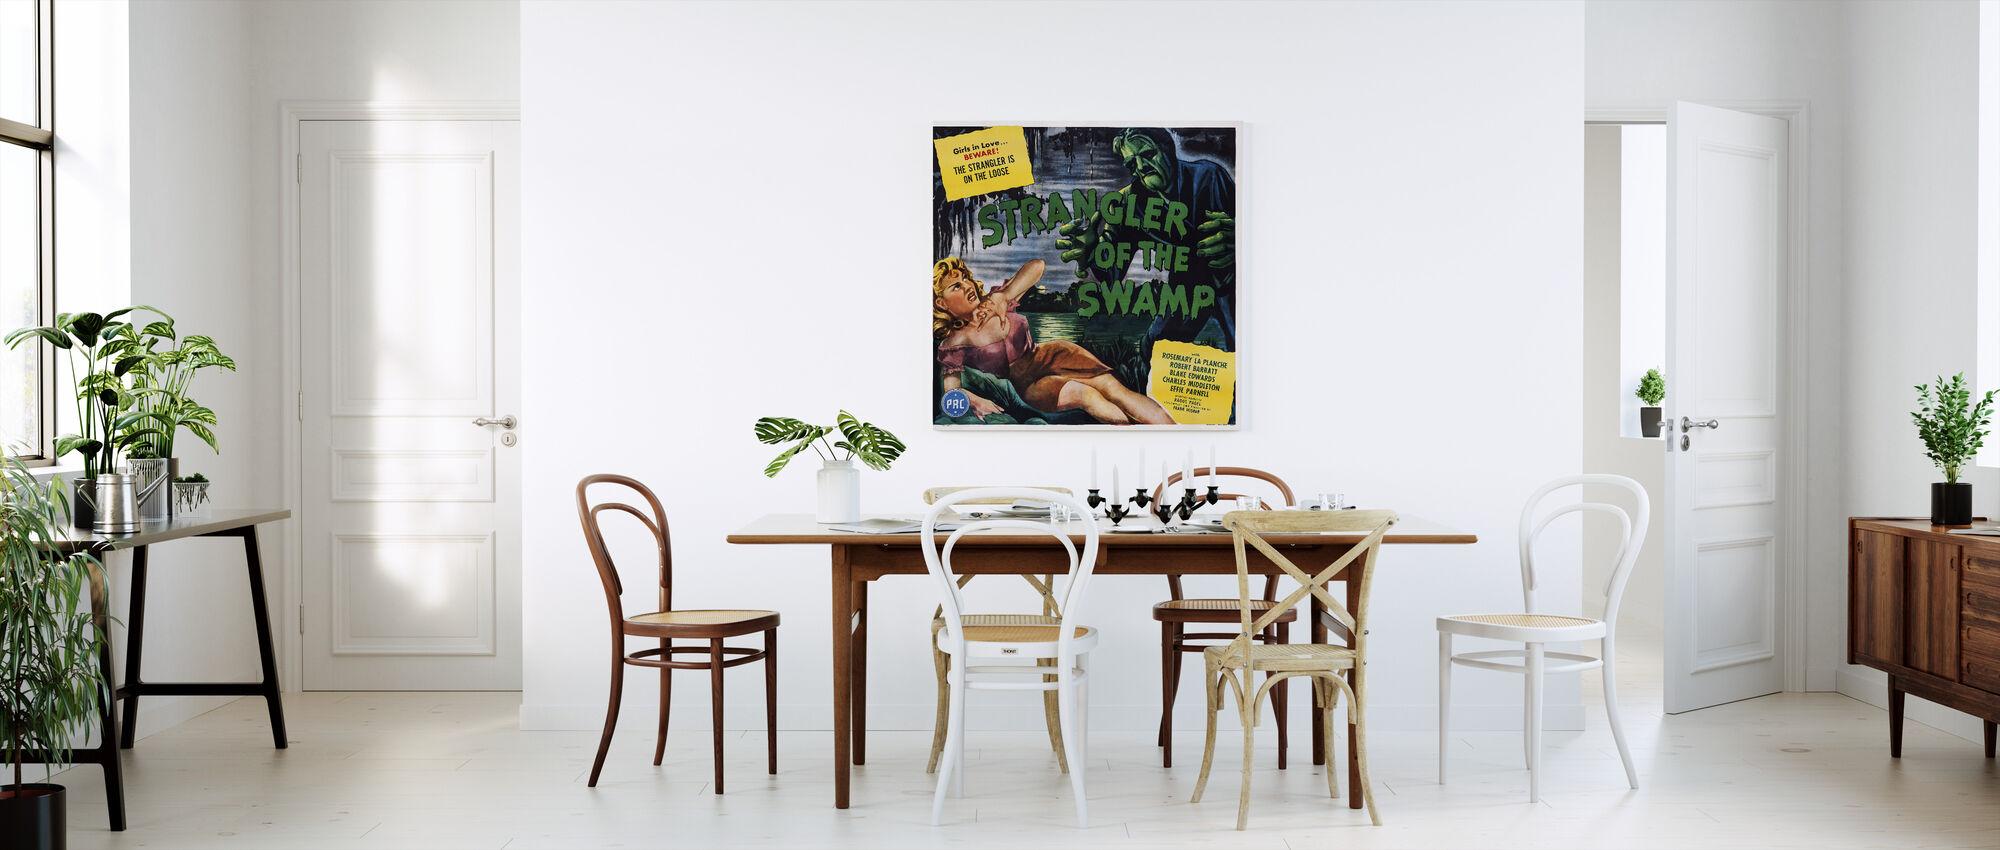 movie poster strangler of the swamp d corer avec une impression sur toile photowall. Black Bedroom Furniture Sets. Home Design Ideas